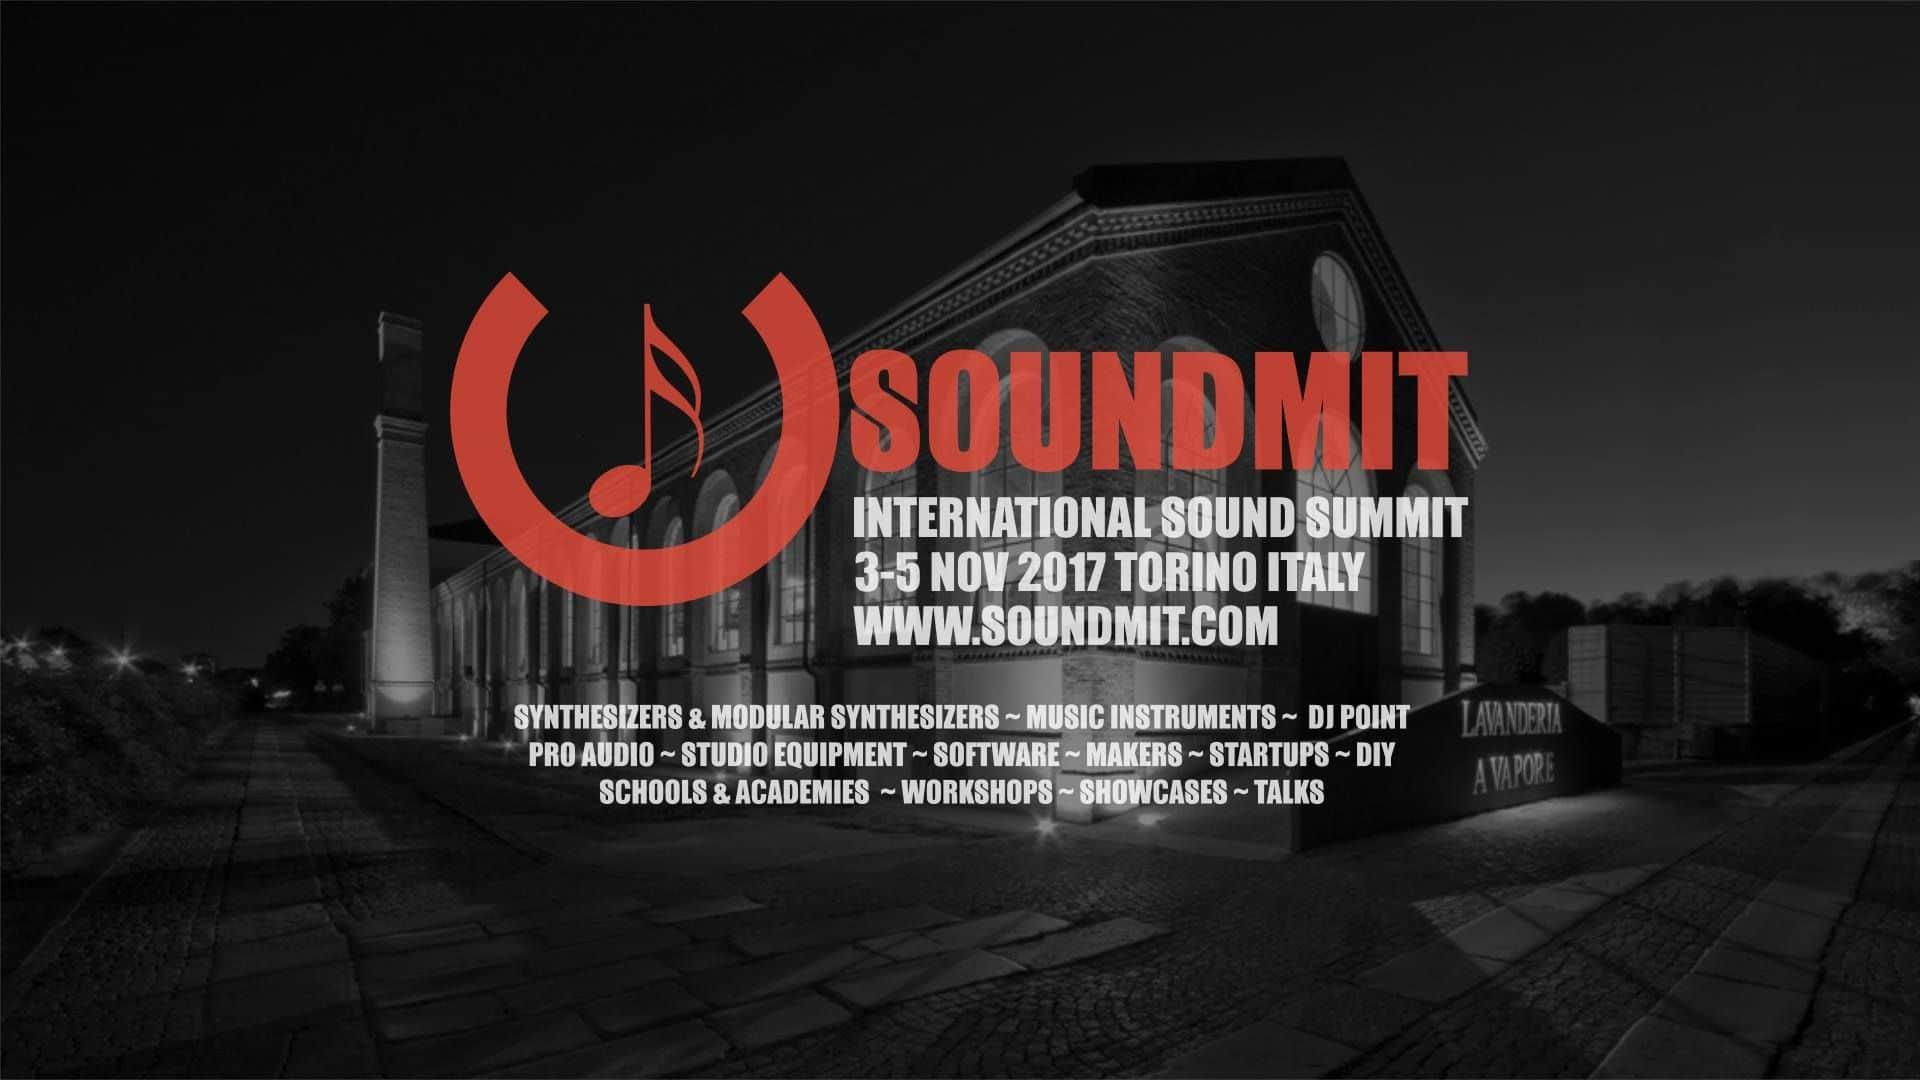 Soundmit Torino - Summit dei Synth analogici ed Eurorack - Novembre 2017 - international sound summit - Killing Toys Roma